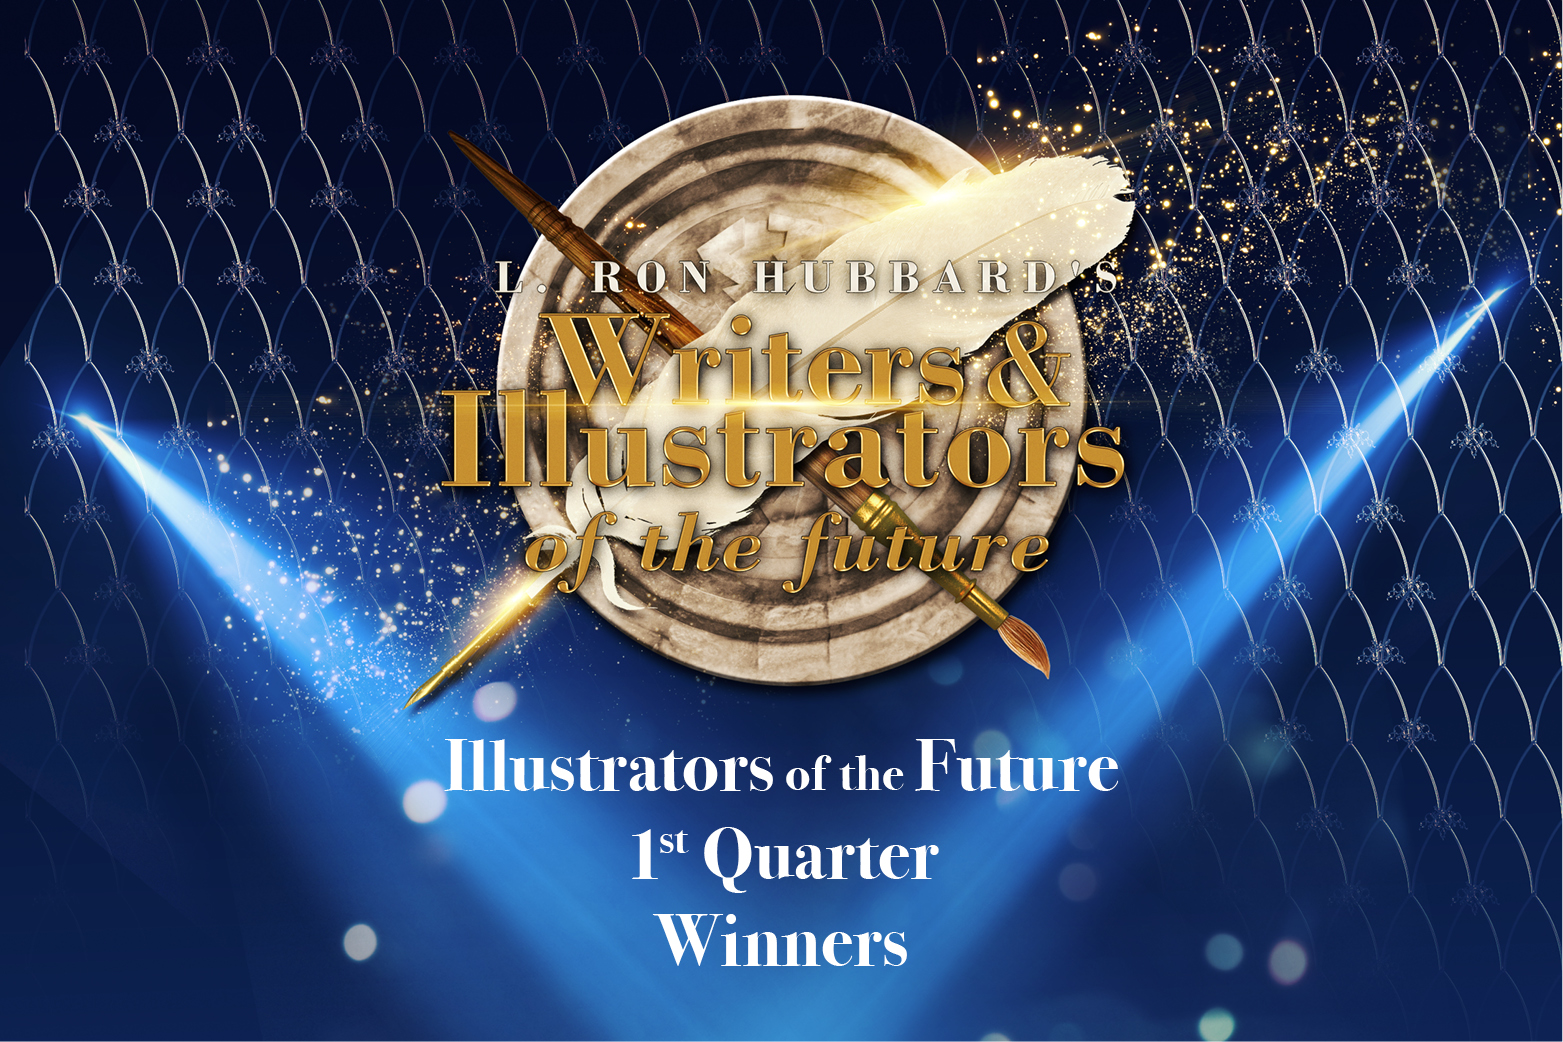 Illustrators of the Future 1st Quarter Winners